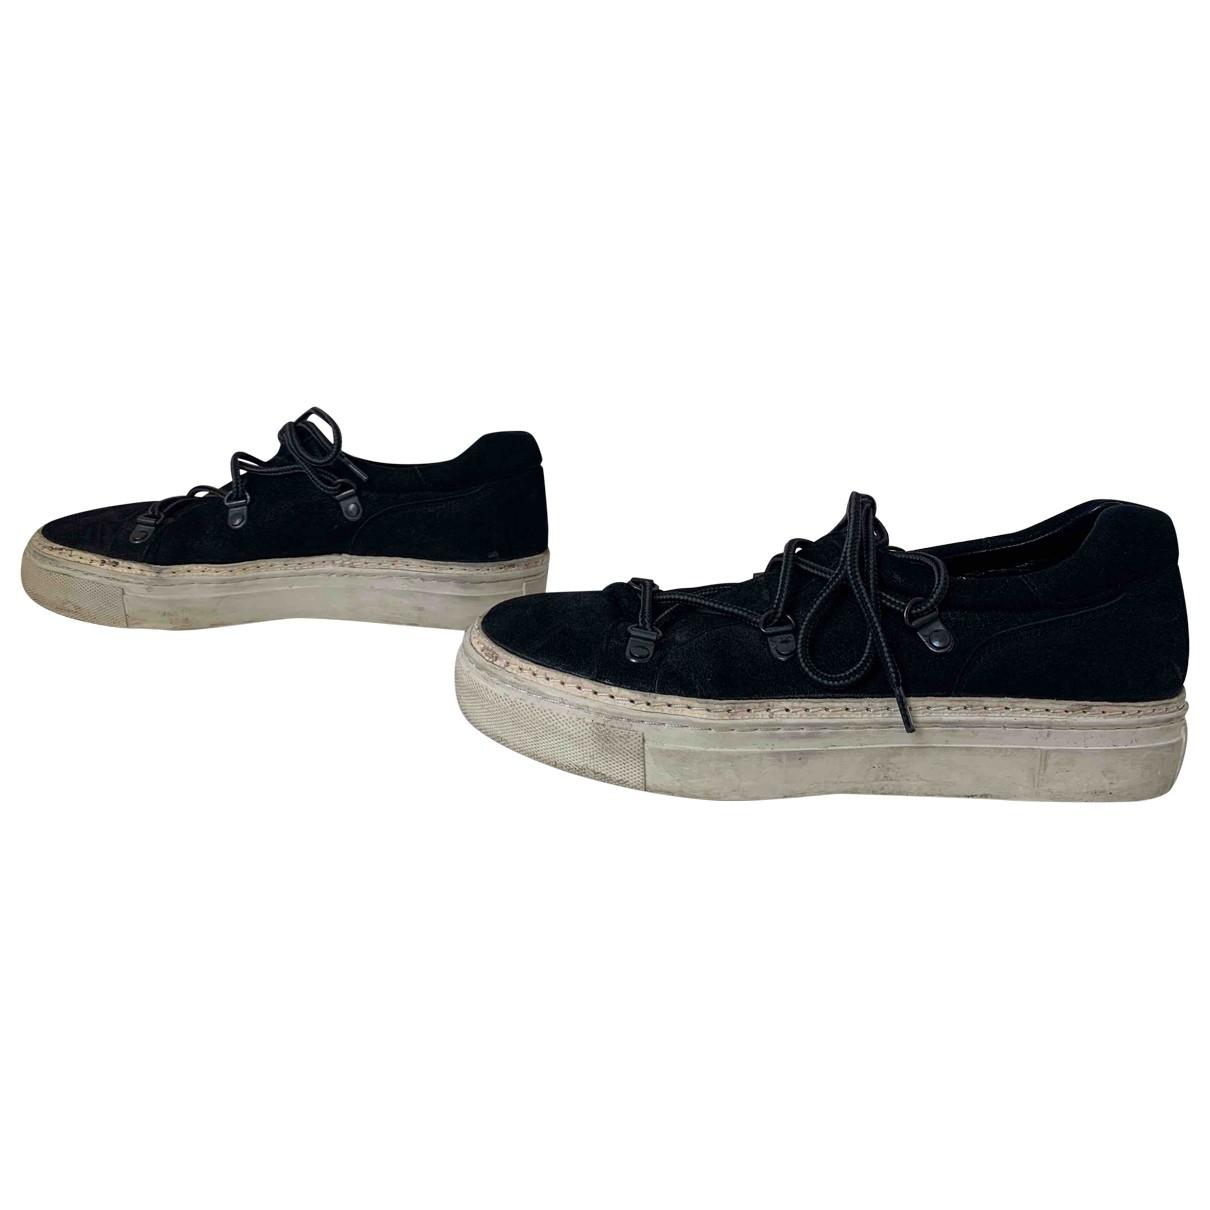 A.f.vandevorst \N Sneakers in  Schwarz Leder